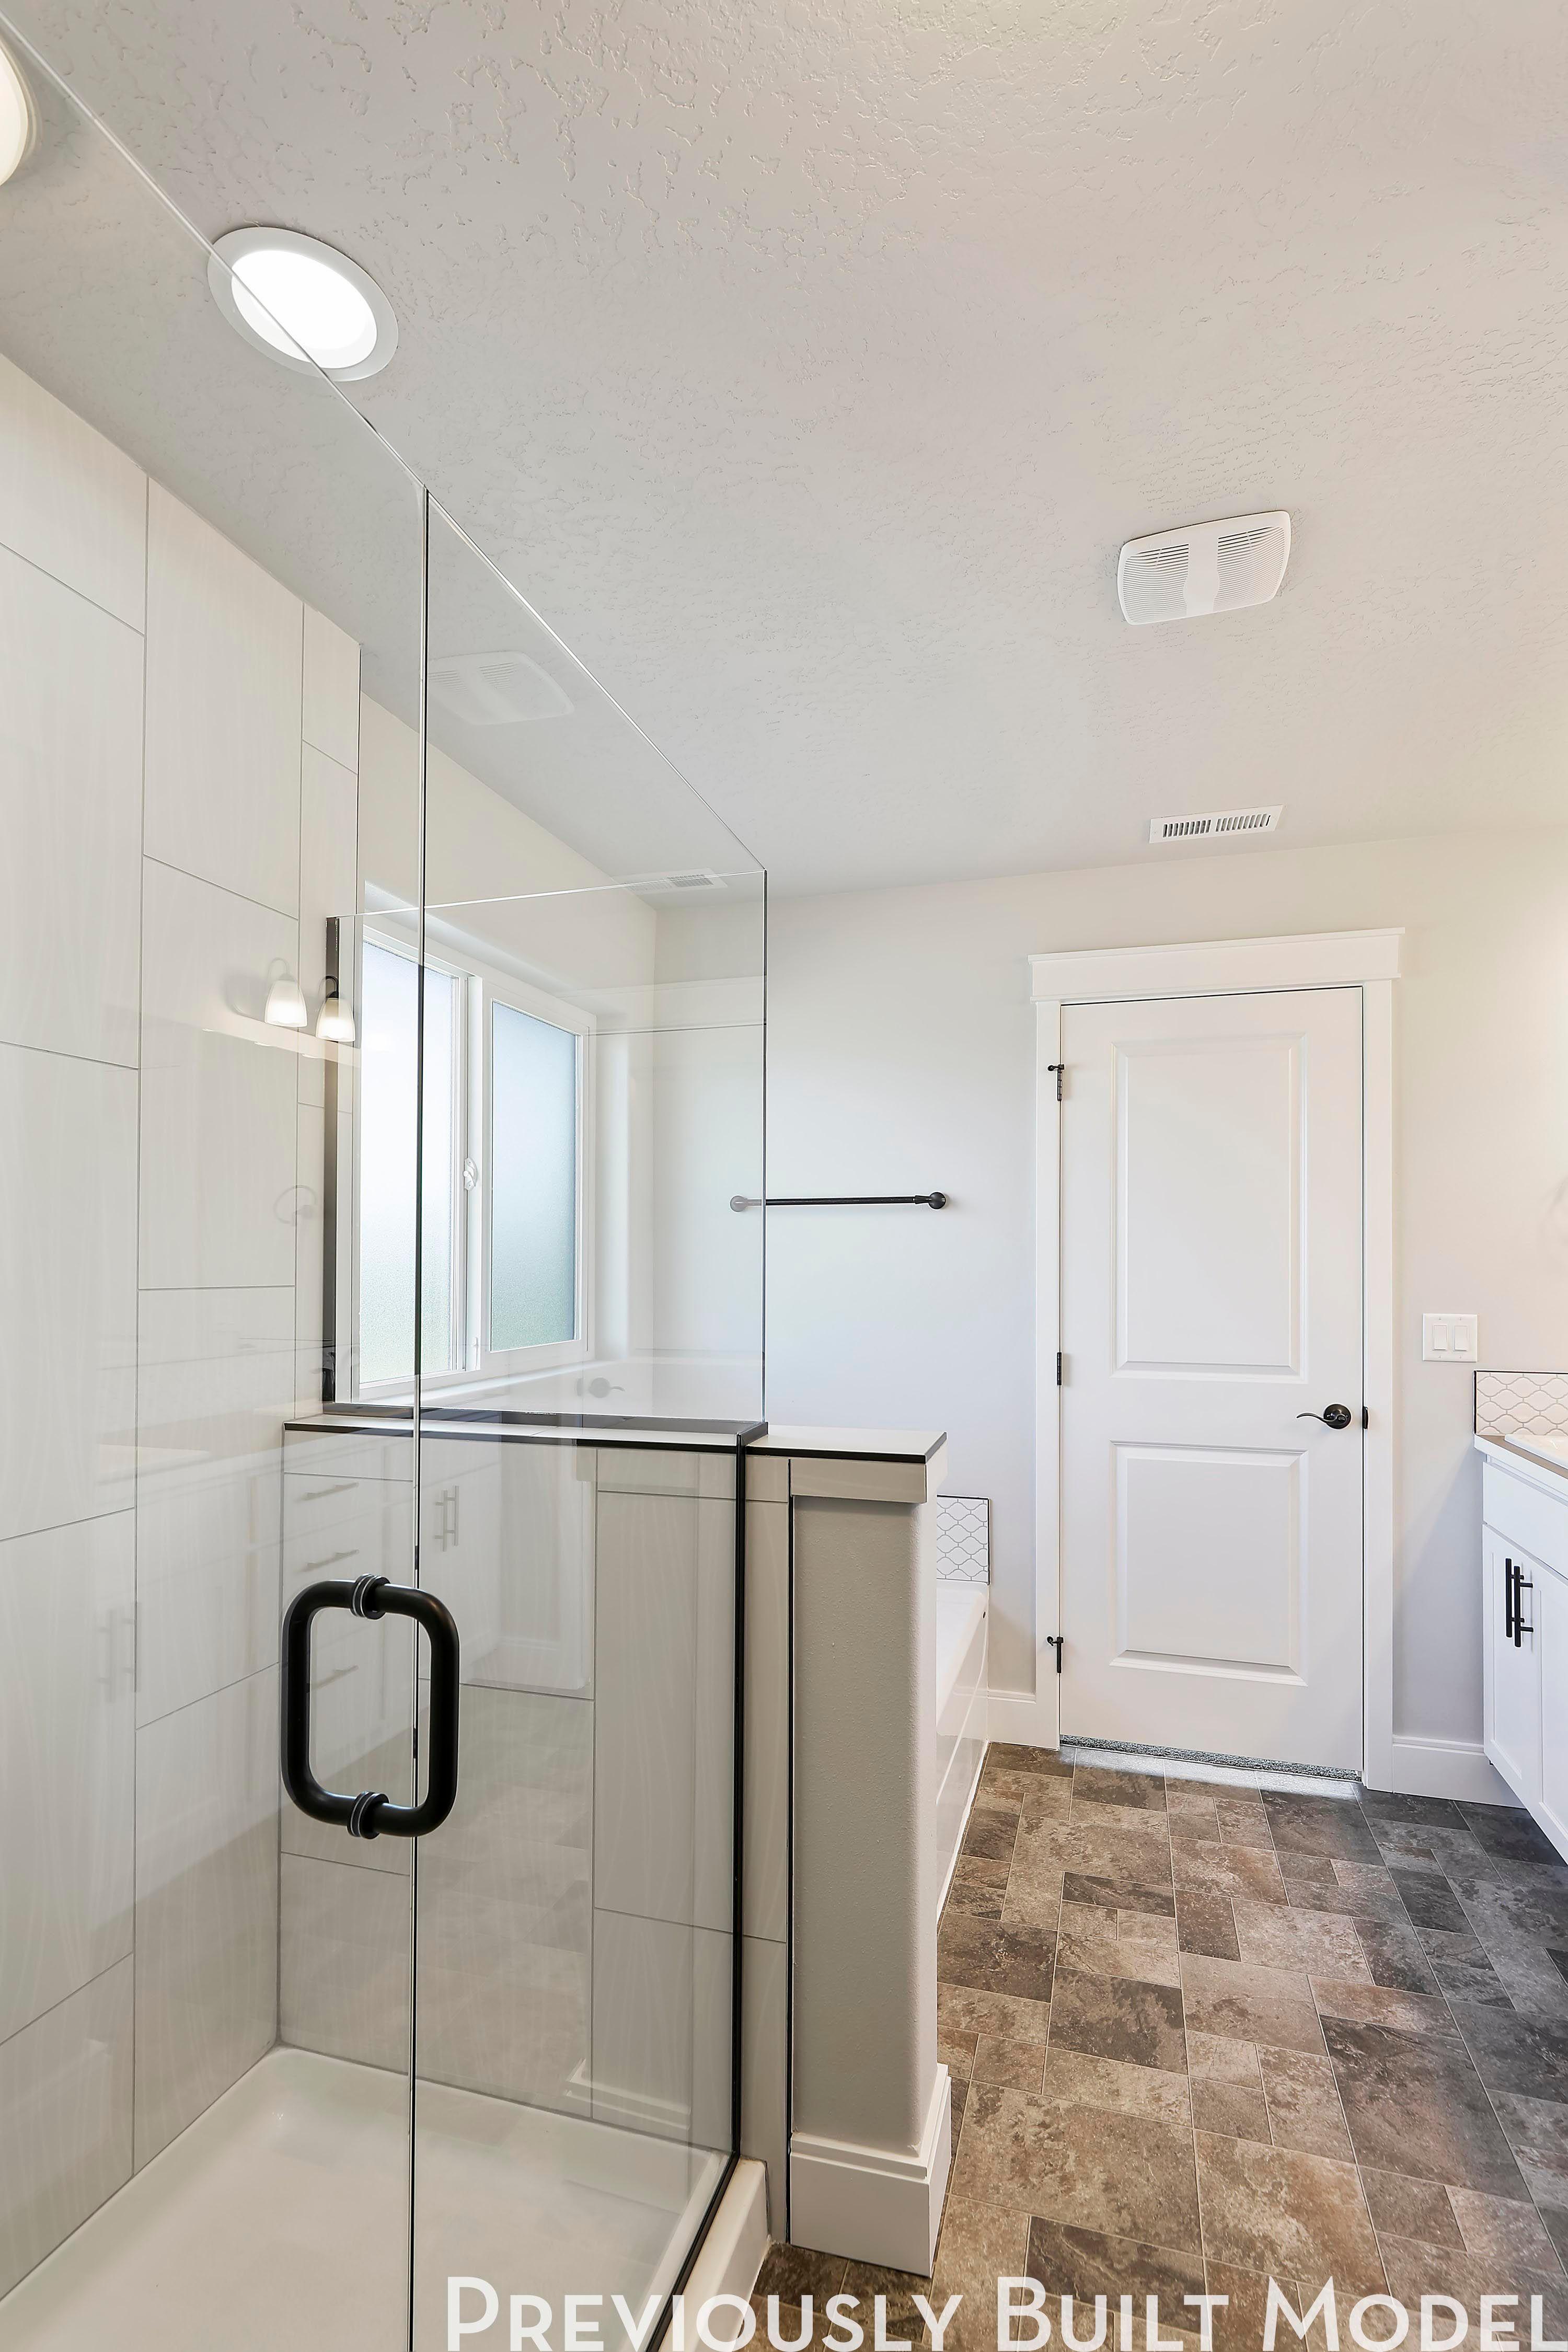 Kitchen featured in The Teton By RYN Built Homes in Spokane-Couer d Alene, WA